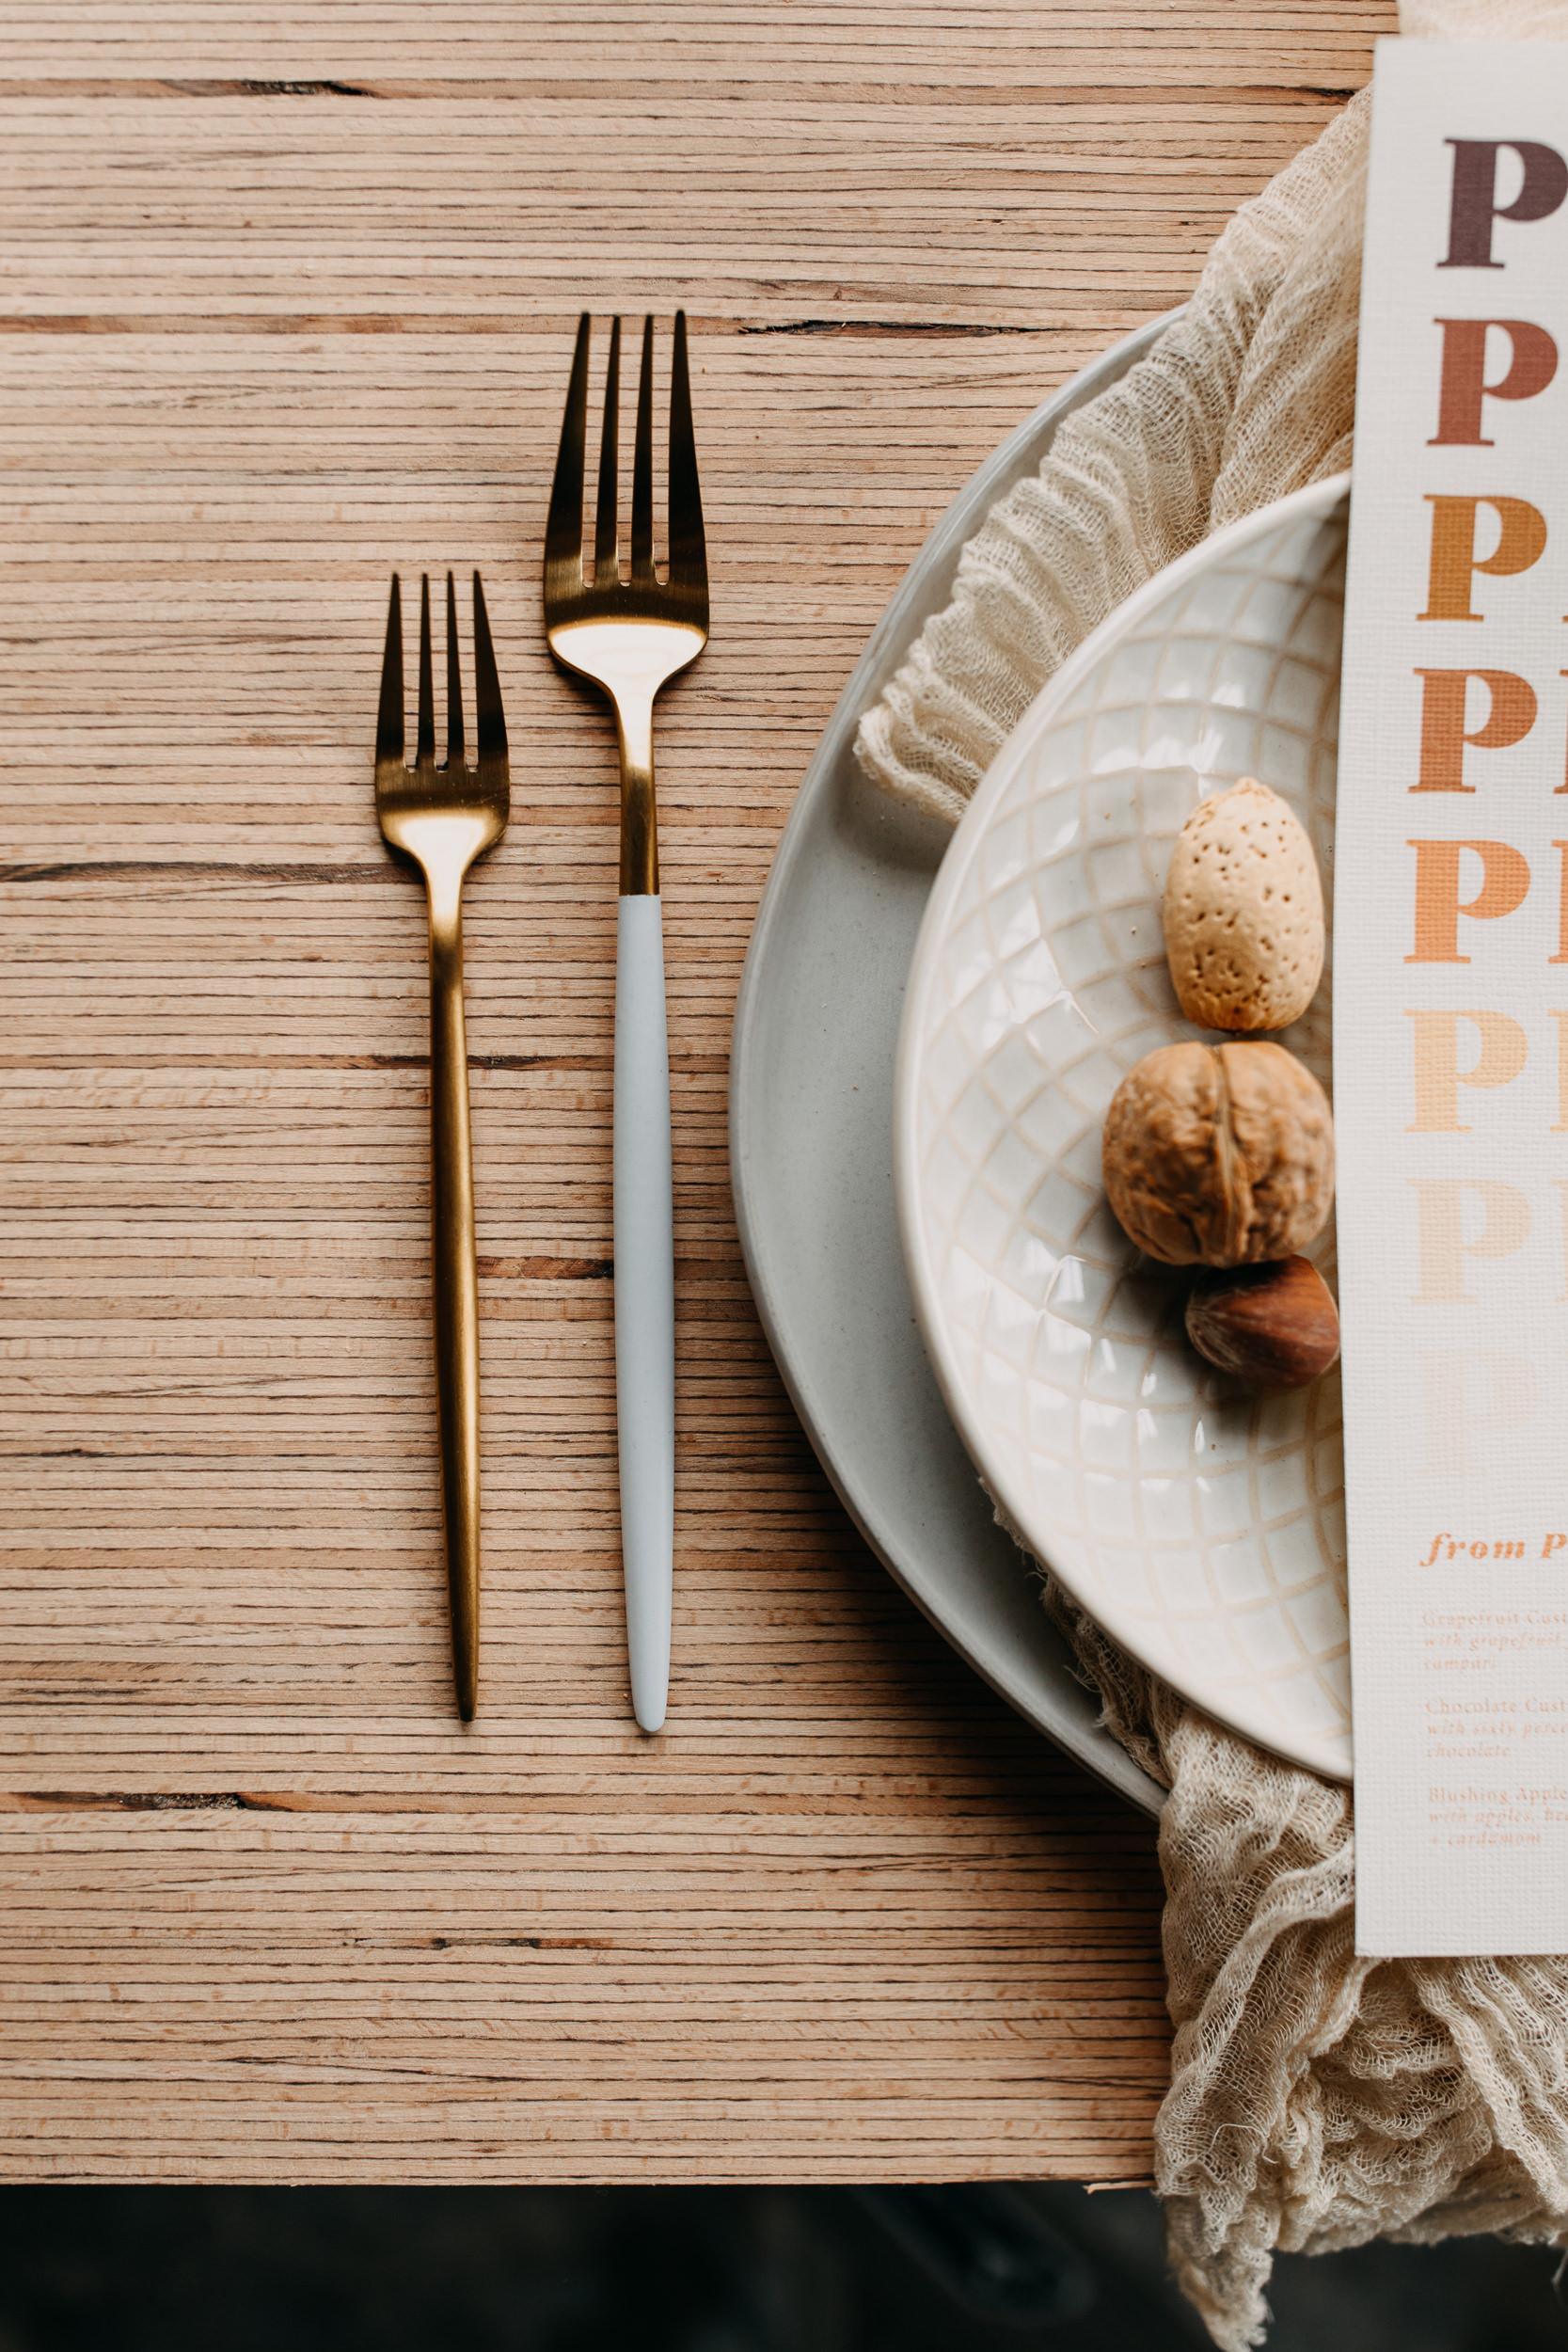 tablescape. wedding menu. reception menu. wedding table. wedding place setting. monochromatic table. monochromatic wedding. monochrome wedding. monochromatic wedding decor. modern wedding table. eclectic wedding table.